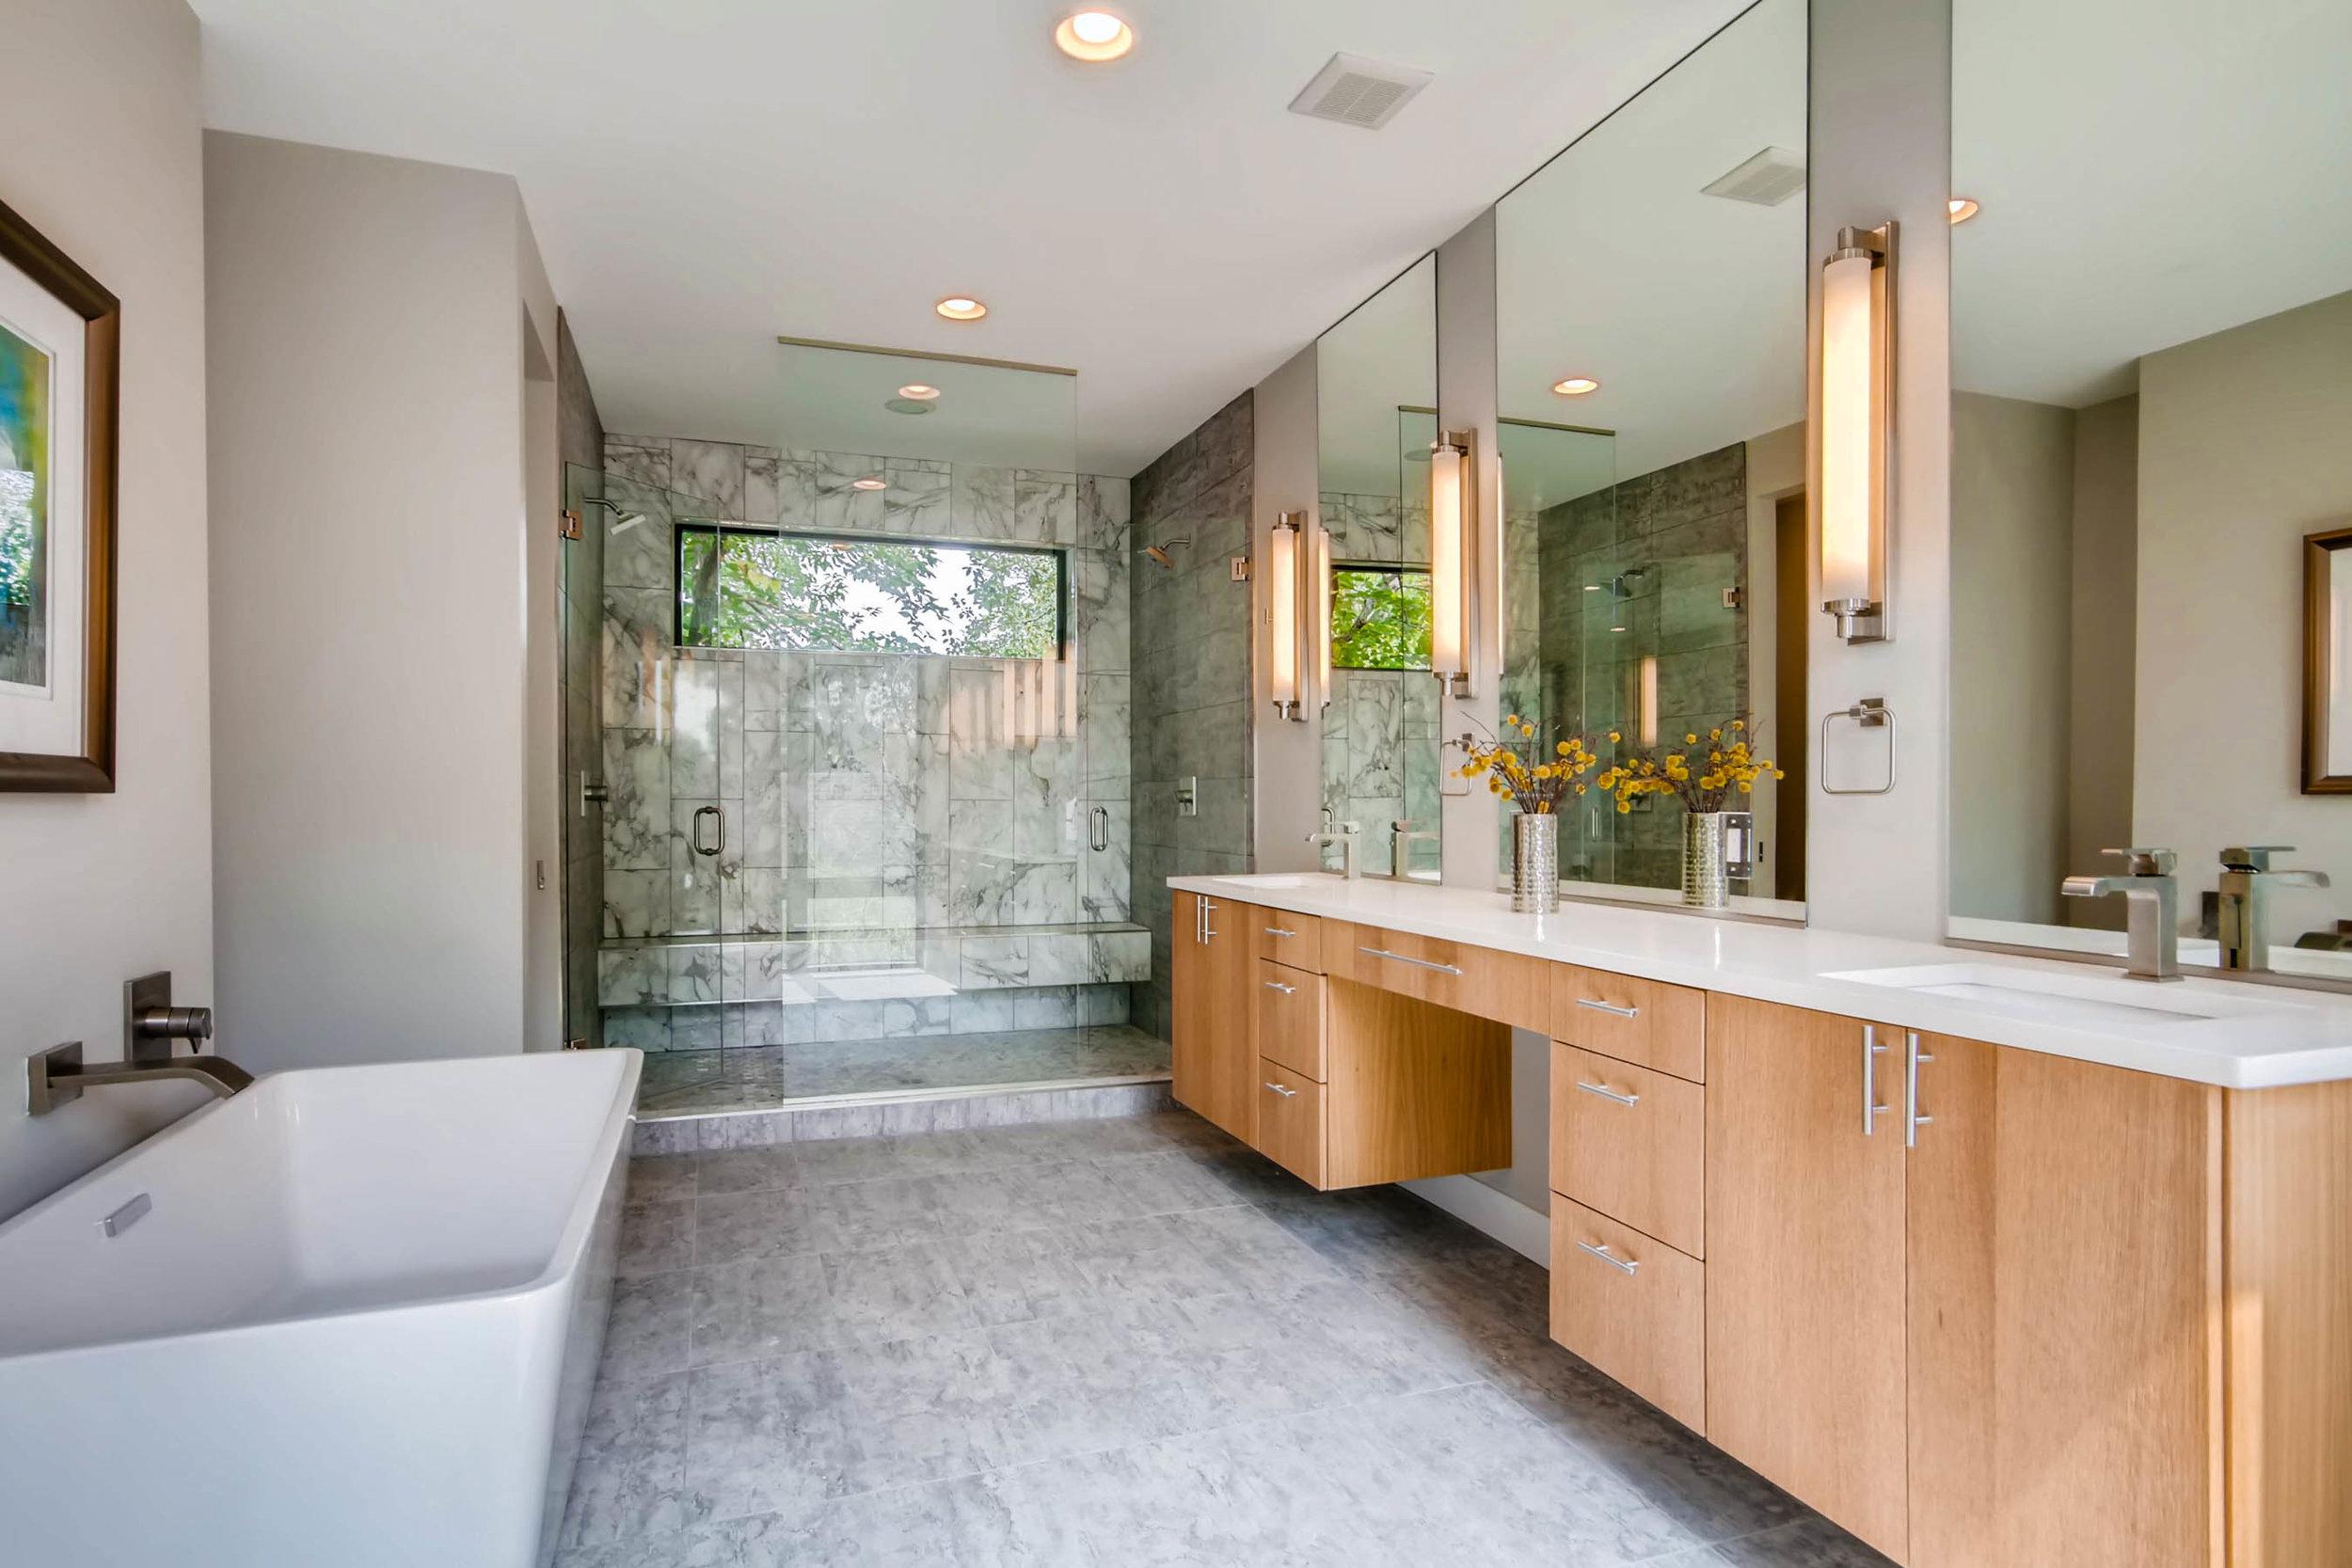 2034 S lafayette Denver CO-print-014-12-2nd Floor Master Bathroom-2700x1800-300dpi.jpg